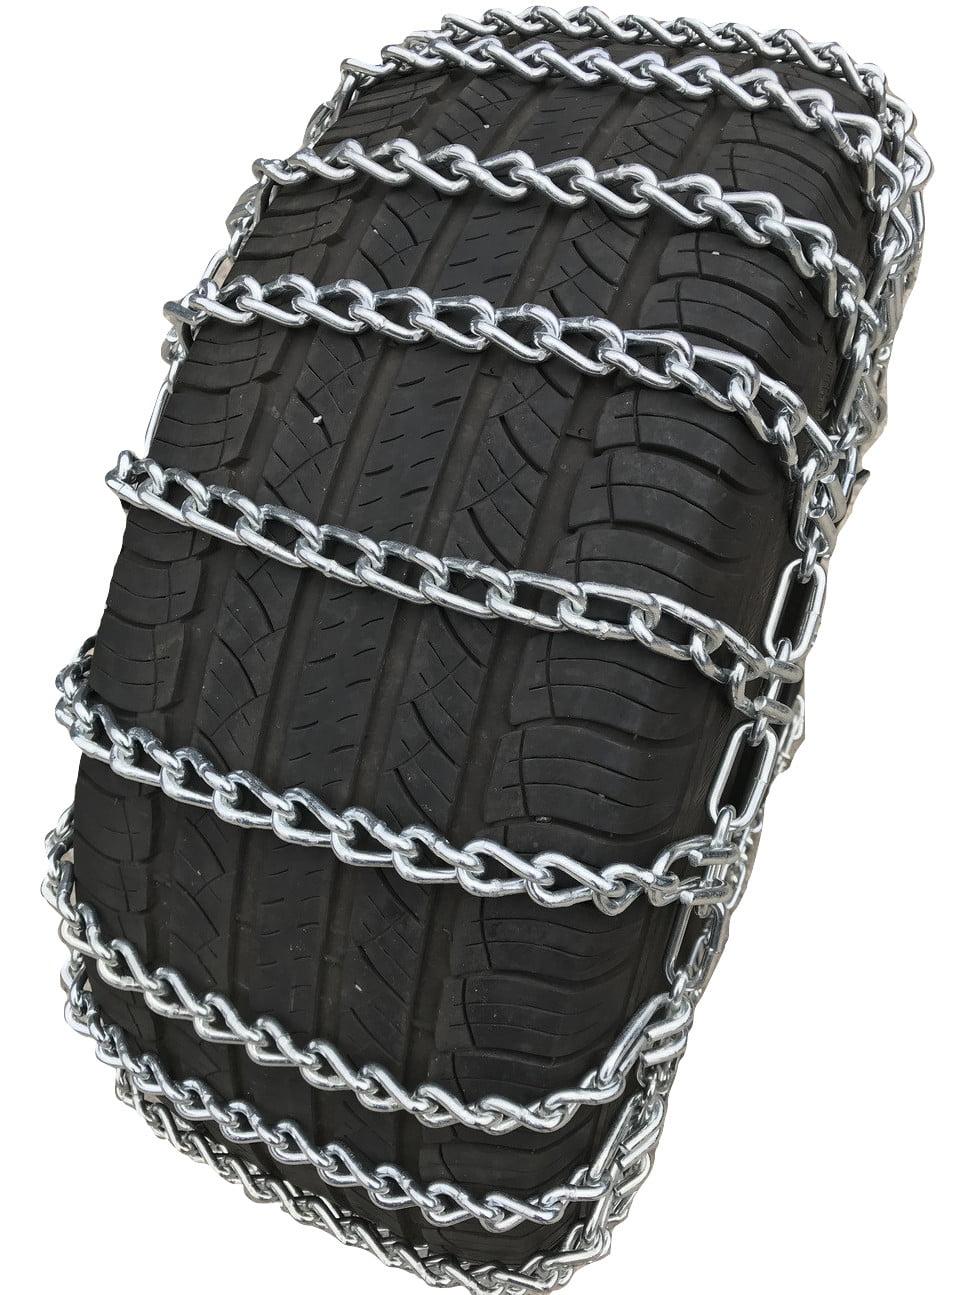 2 Chains - Tire Size 25x8x12 Front Snow Chains 2002-2004 Polaris 700 Sportsman